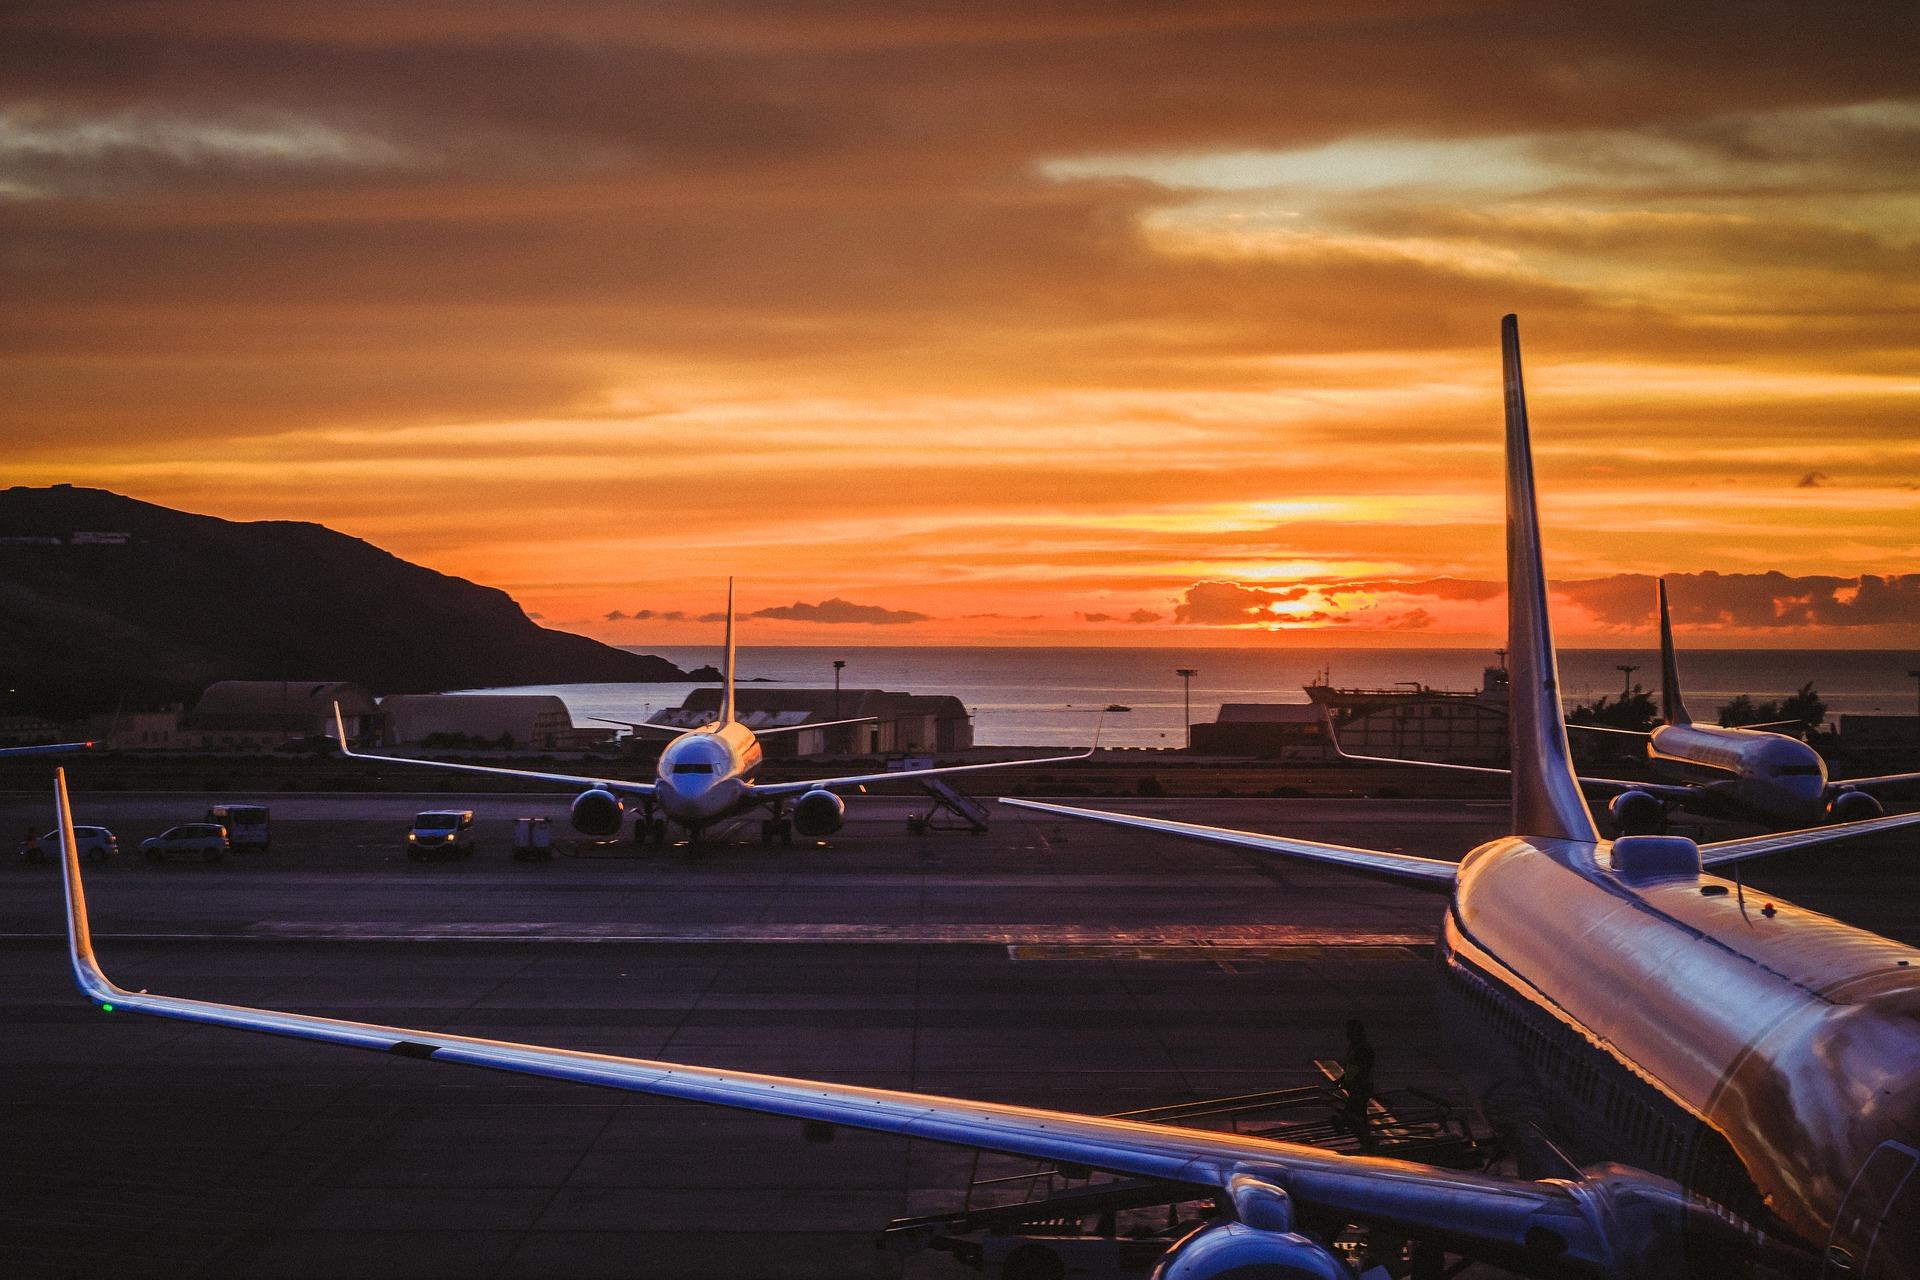 airport-3451416_1920